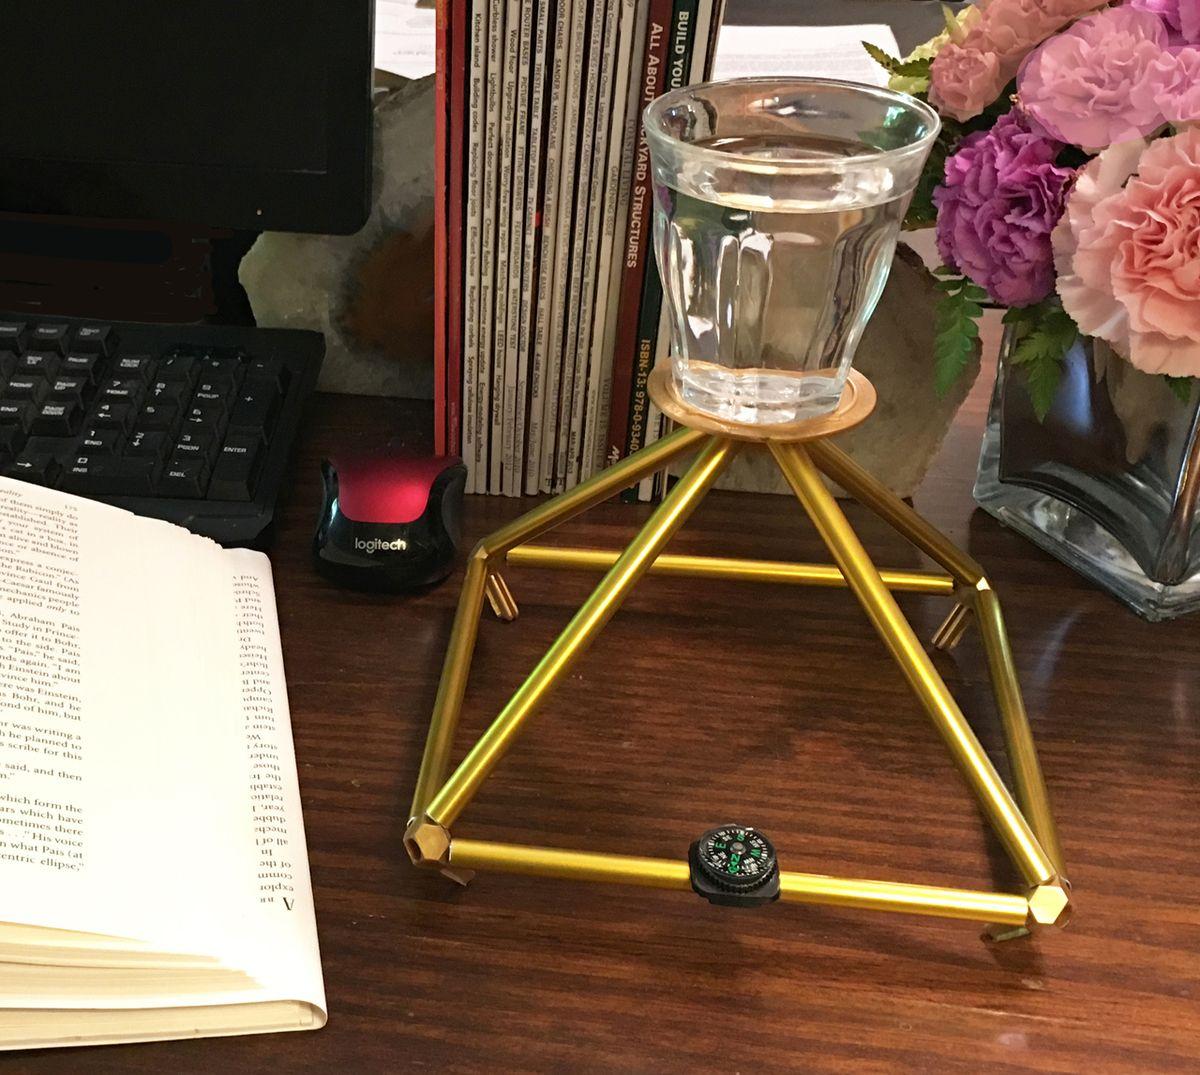 Energy Pyramid Baby! Nick Edwards Pyramid Power Kit 6 inch